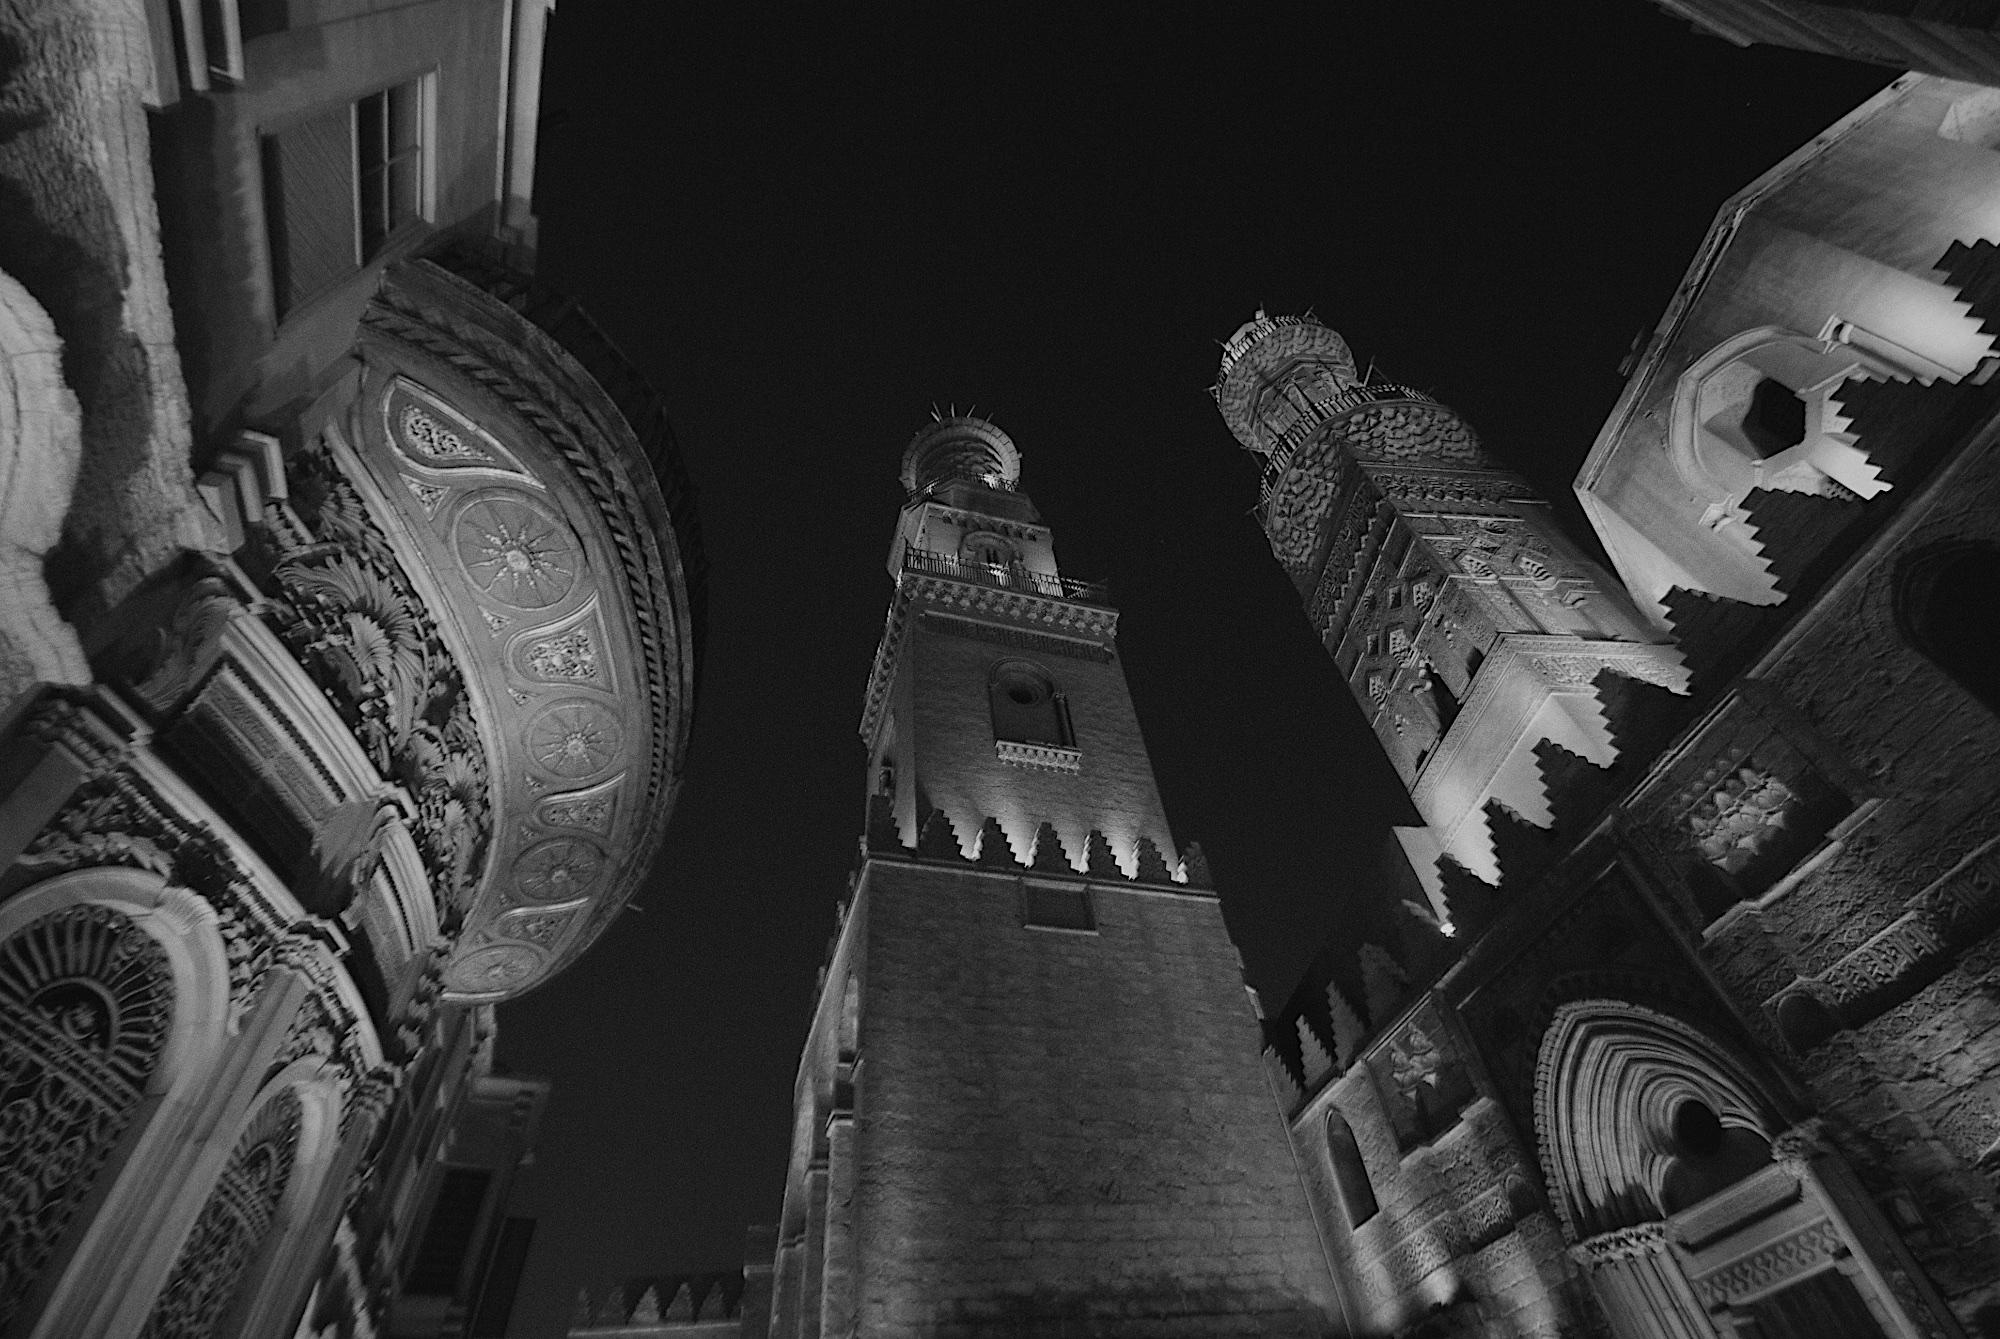 denis-bosnic-cairo-egypt-bw-photography-11-islamic-mosque-complex-qalawun-madrasa-minarets.jpg